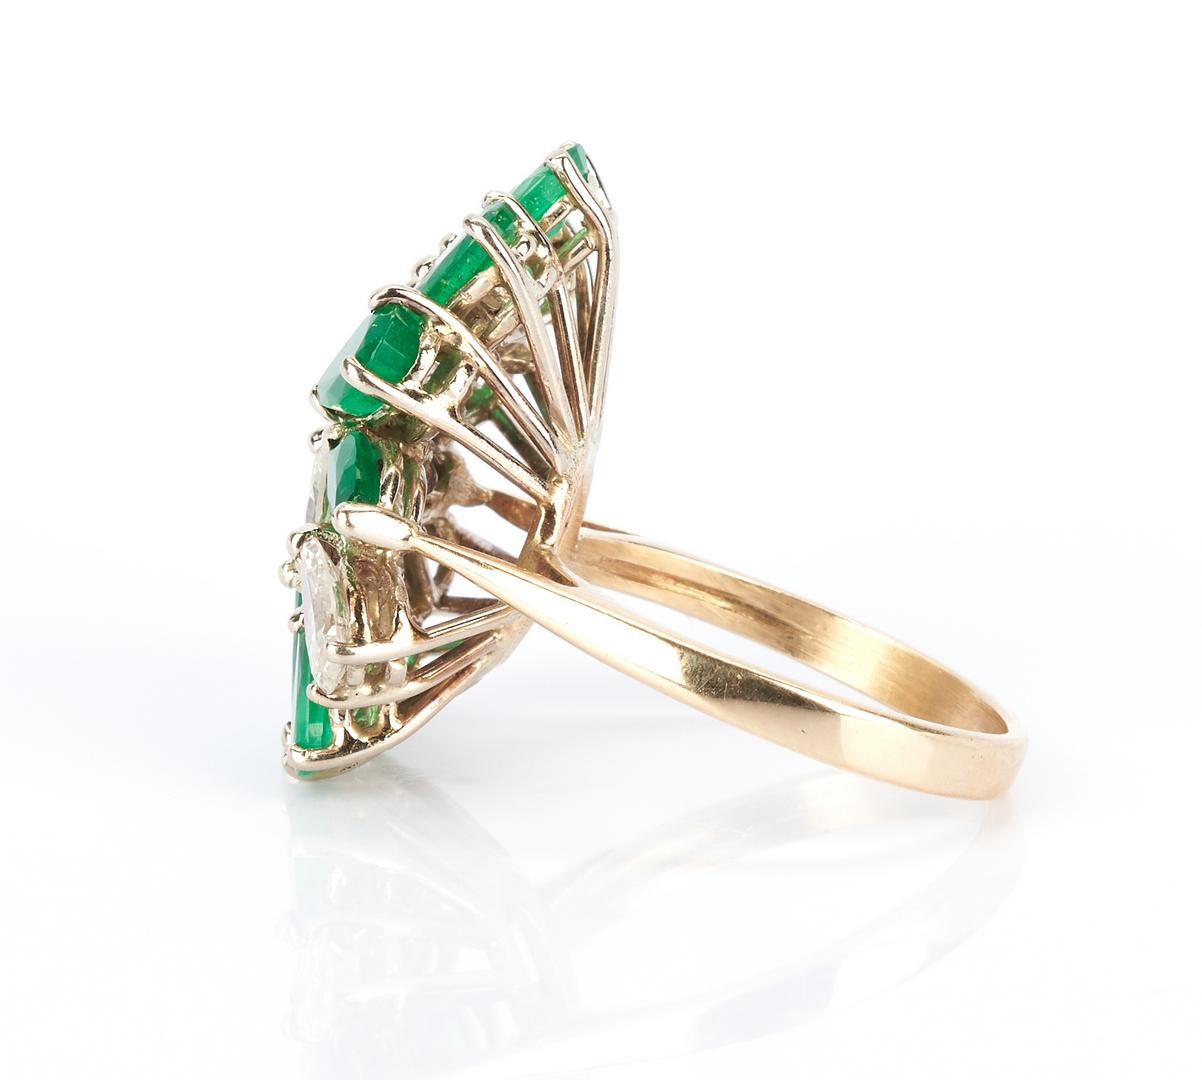 Lot 487: Ladies Emerald & Diamond Dinner Ring